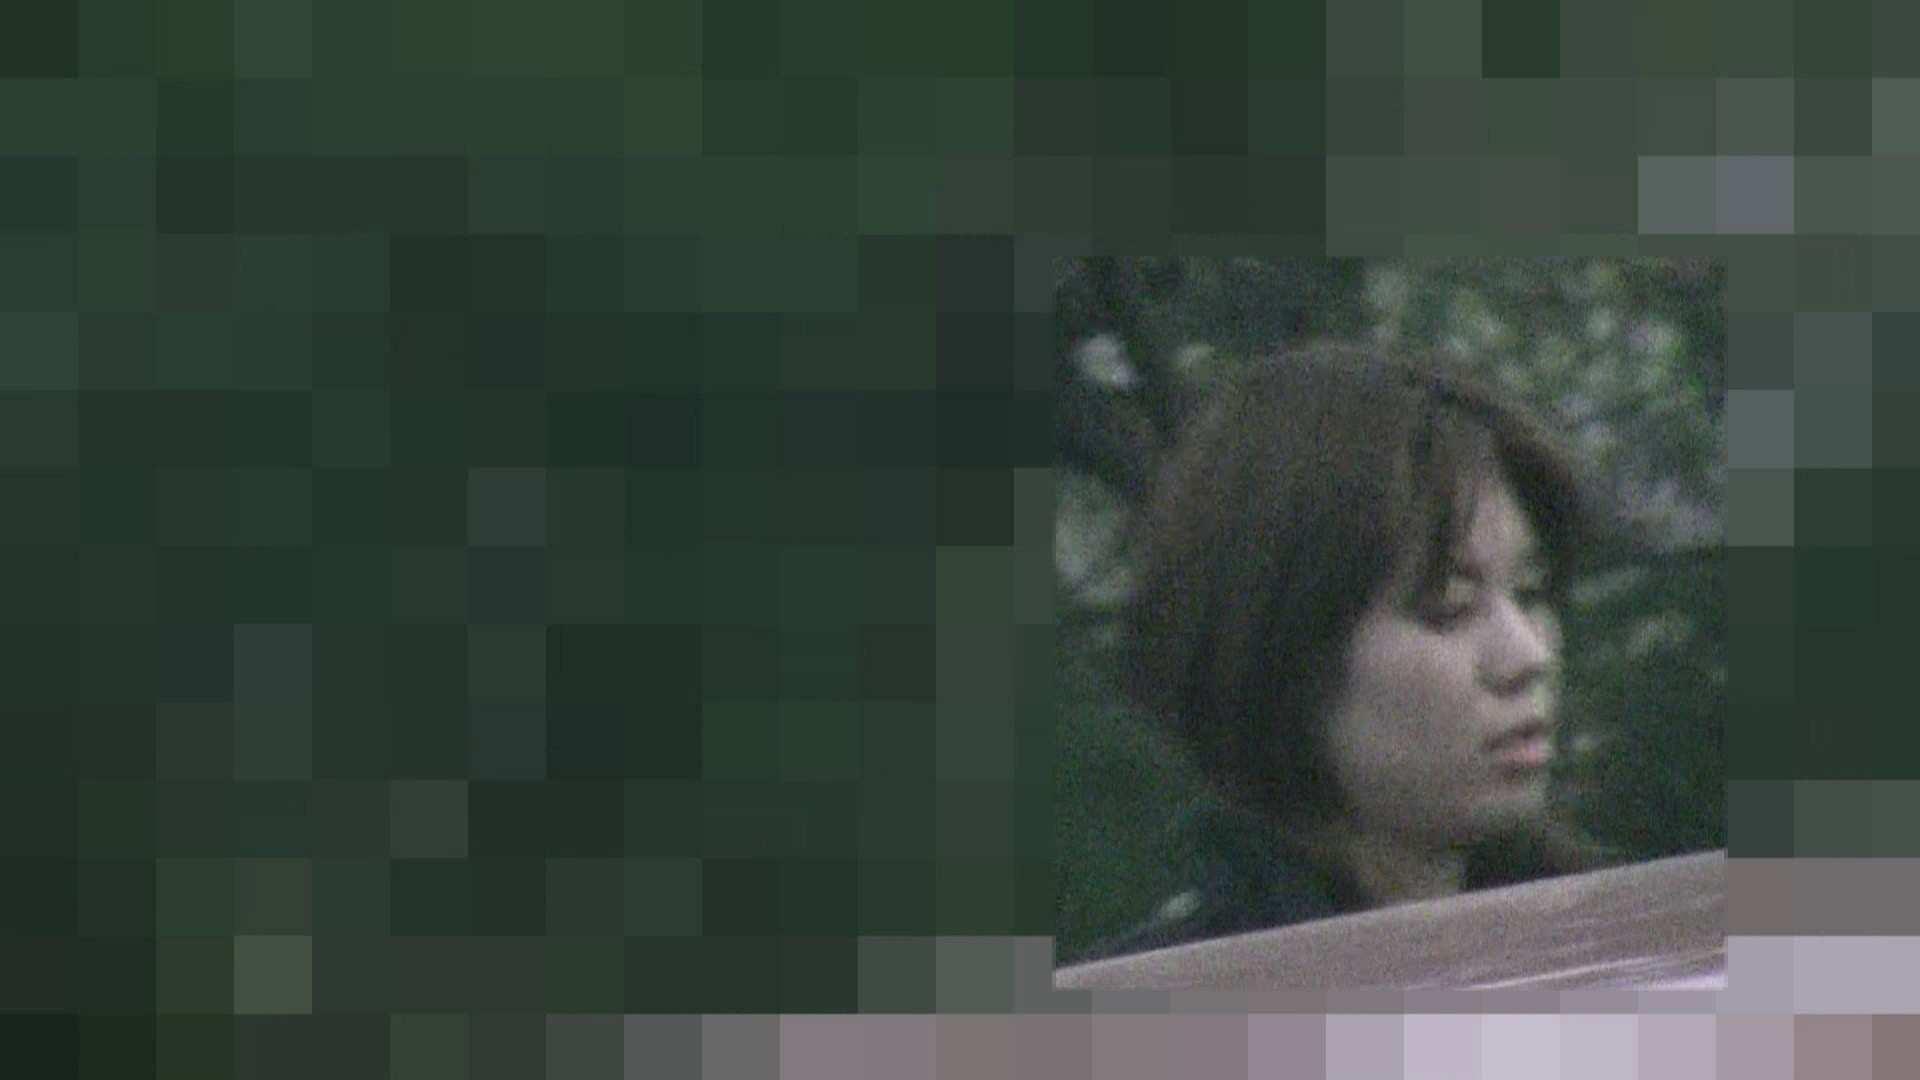 Aquaな露天風呂Vol.587 OLすけべ画像 隠し撮りオマンコ動画紹介 29連発 2